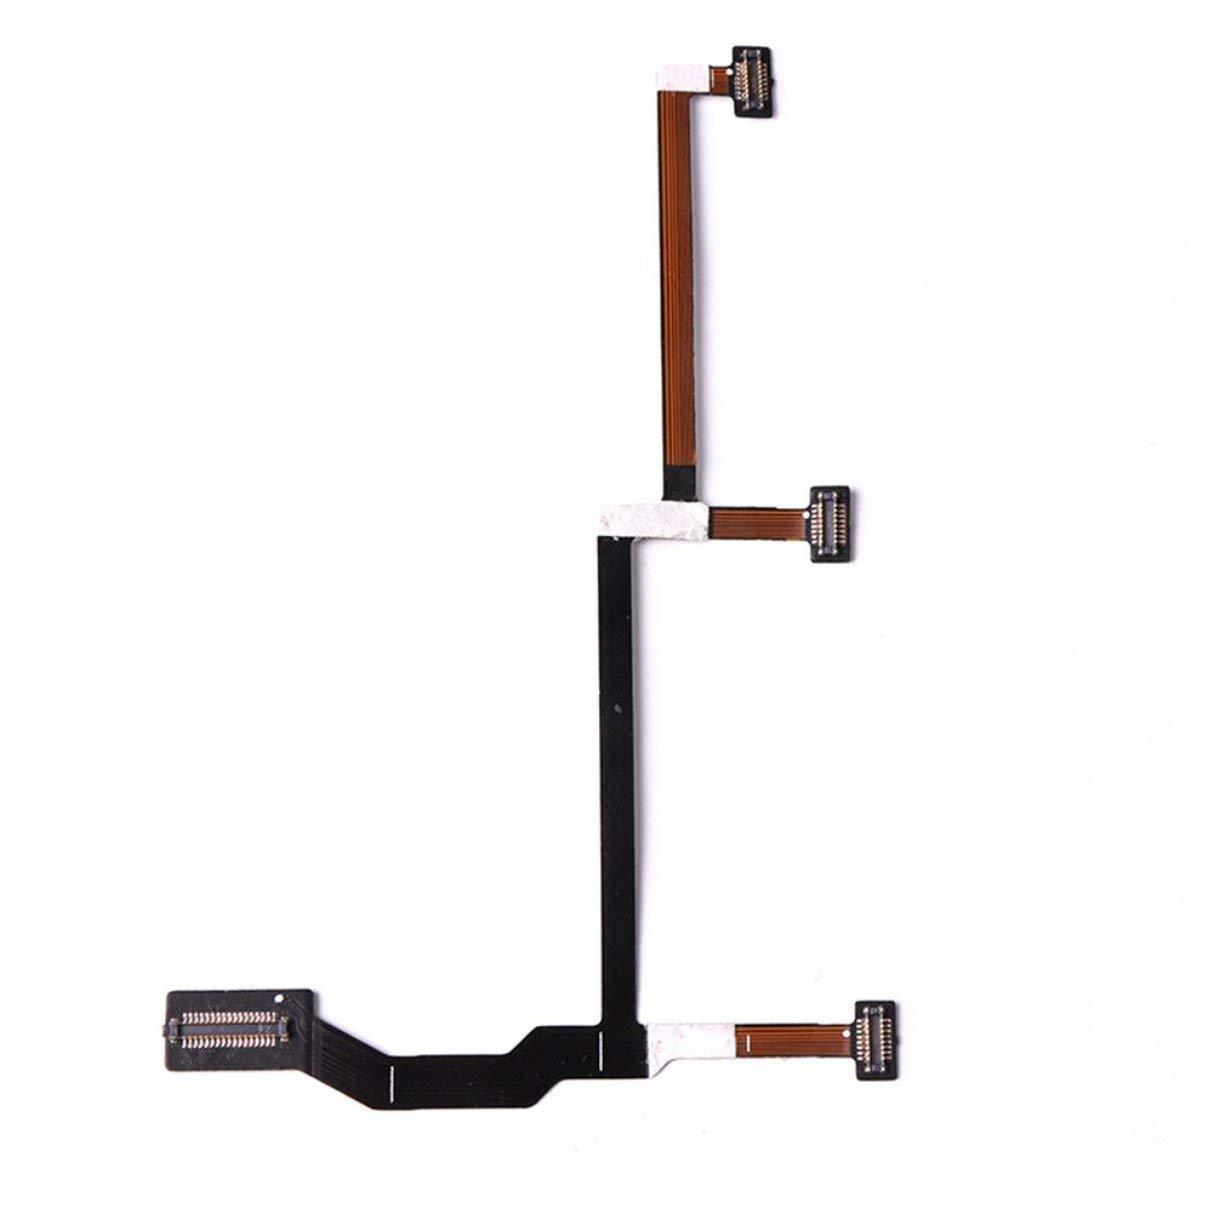 Soft Flexible Flat Gimbal Cable Layer Flat Ribbon Drone Repairing Cable for DJI Mavic Pro PTZ Maintenance Accessories